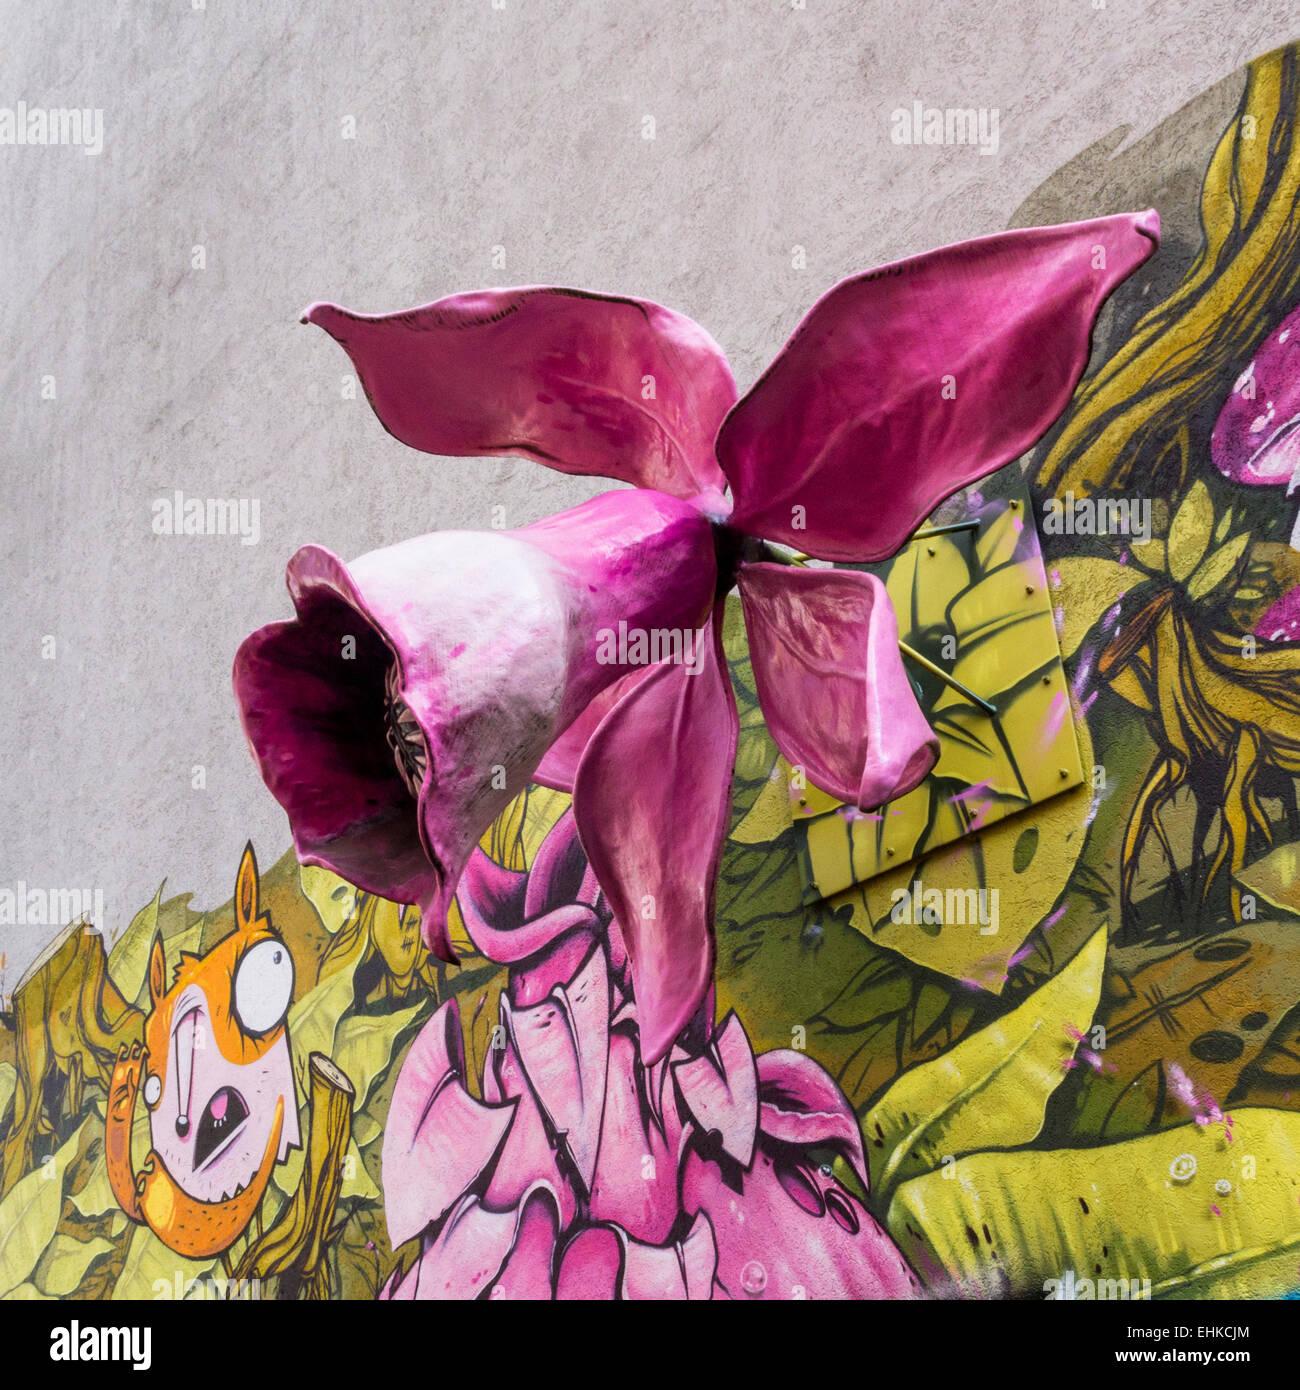 Berlin Street art and Graffiti, giant pink 3-D flower colourful floral urban mural art, Maybachufer, Berlin - Stock Image